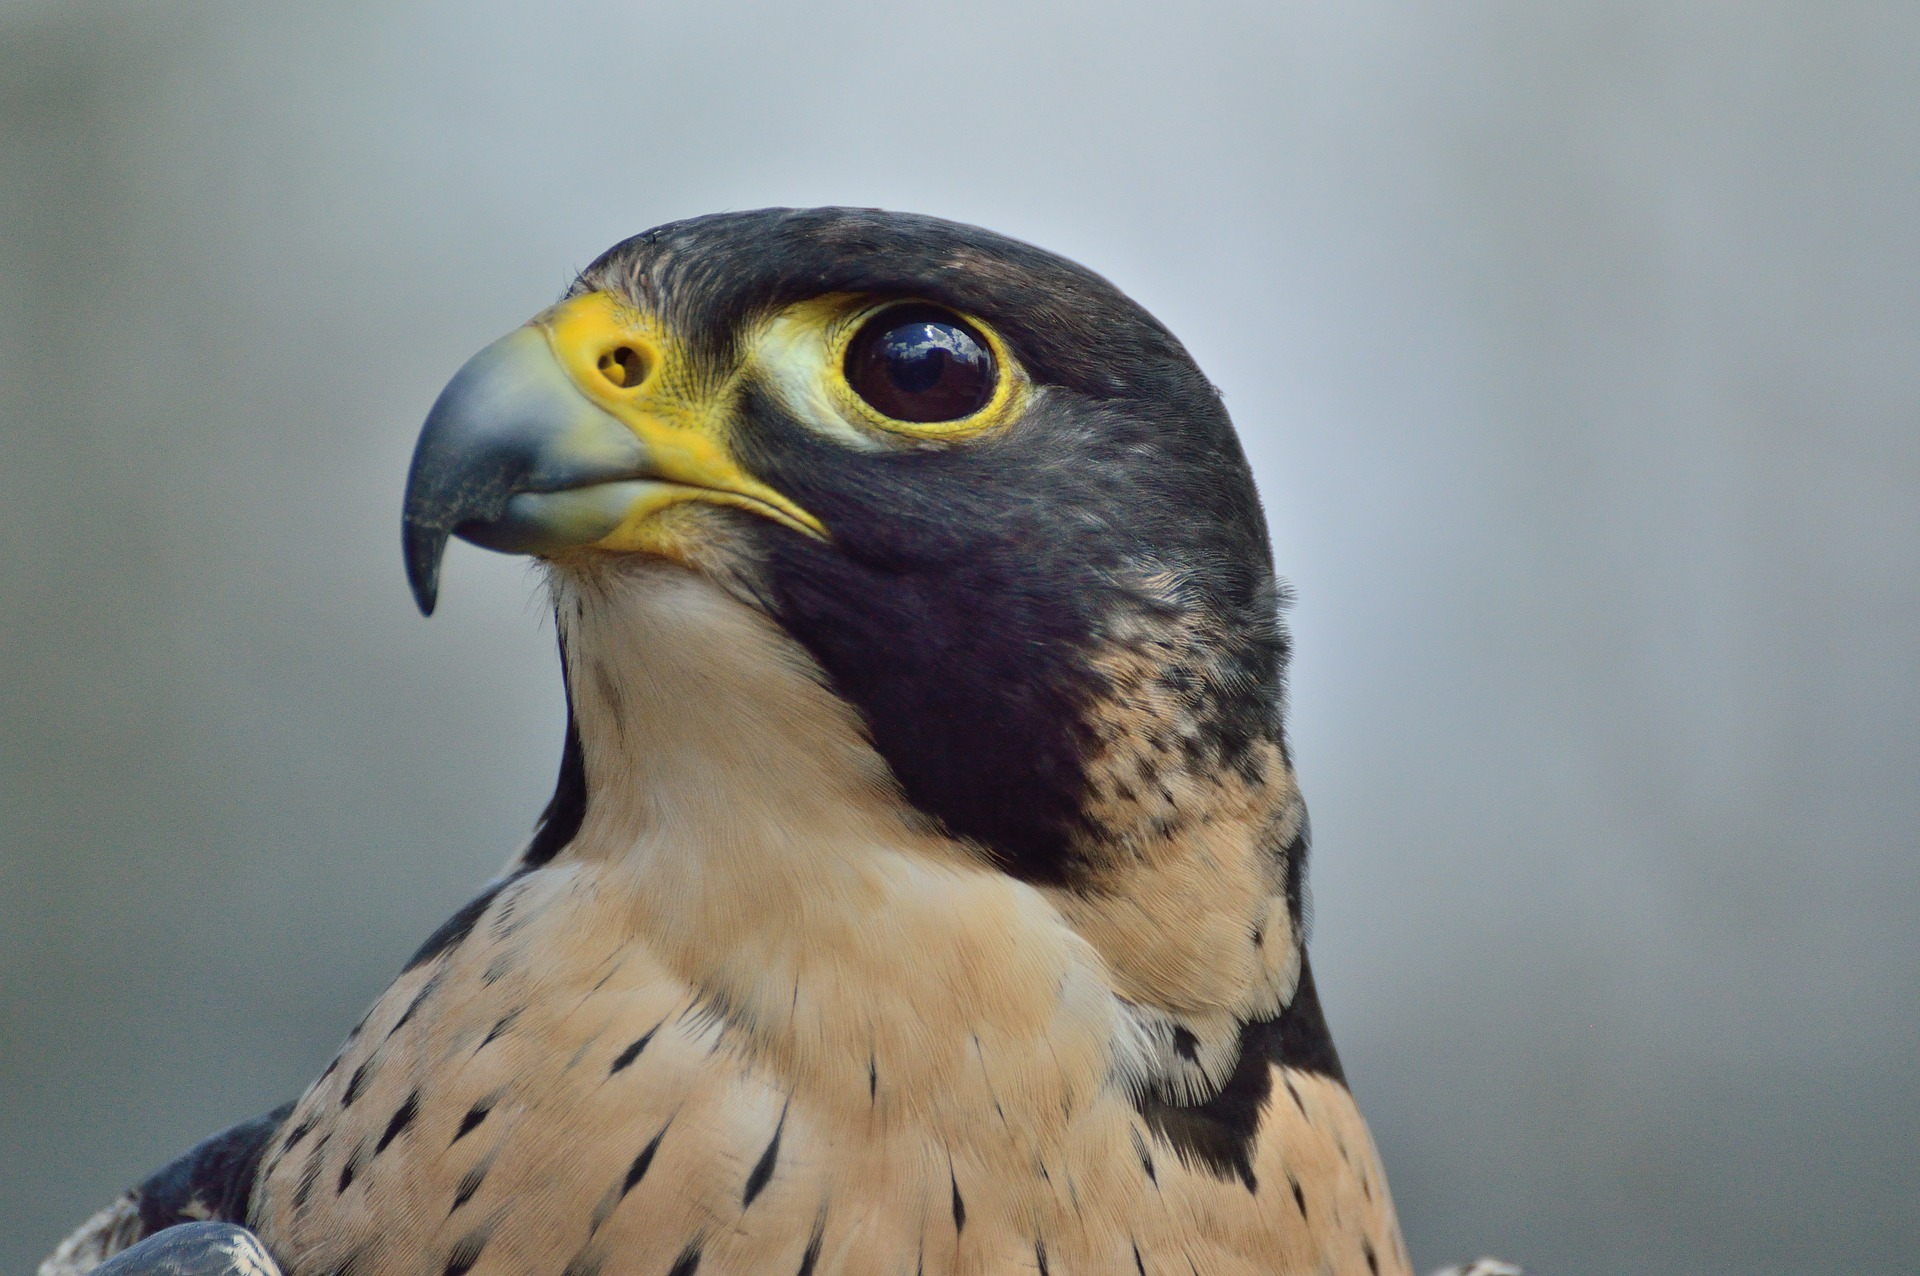 peregrine-falcon-371610_1920.jpg